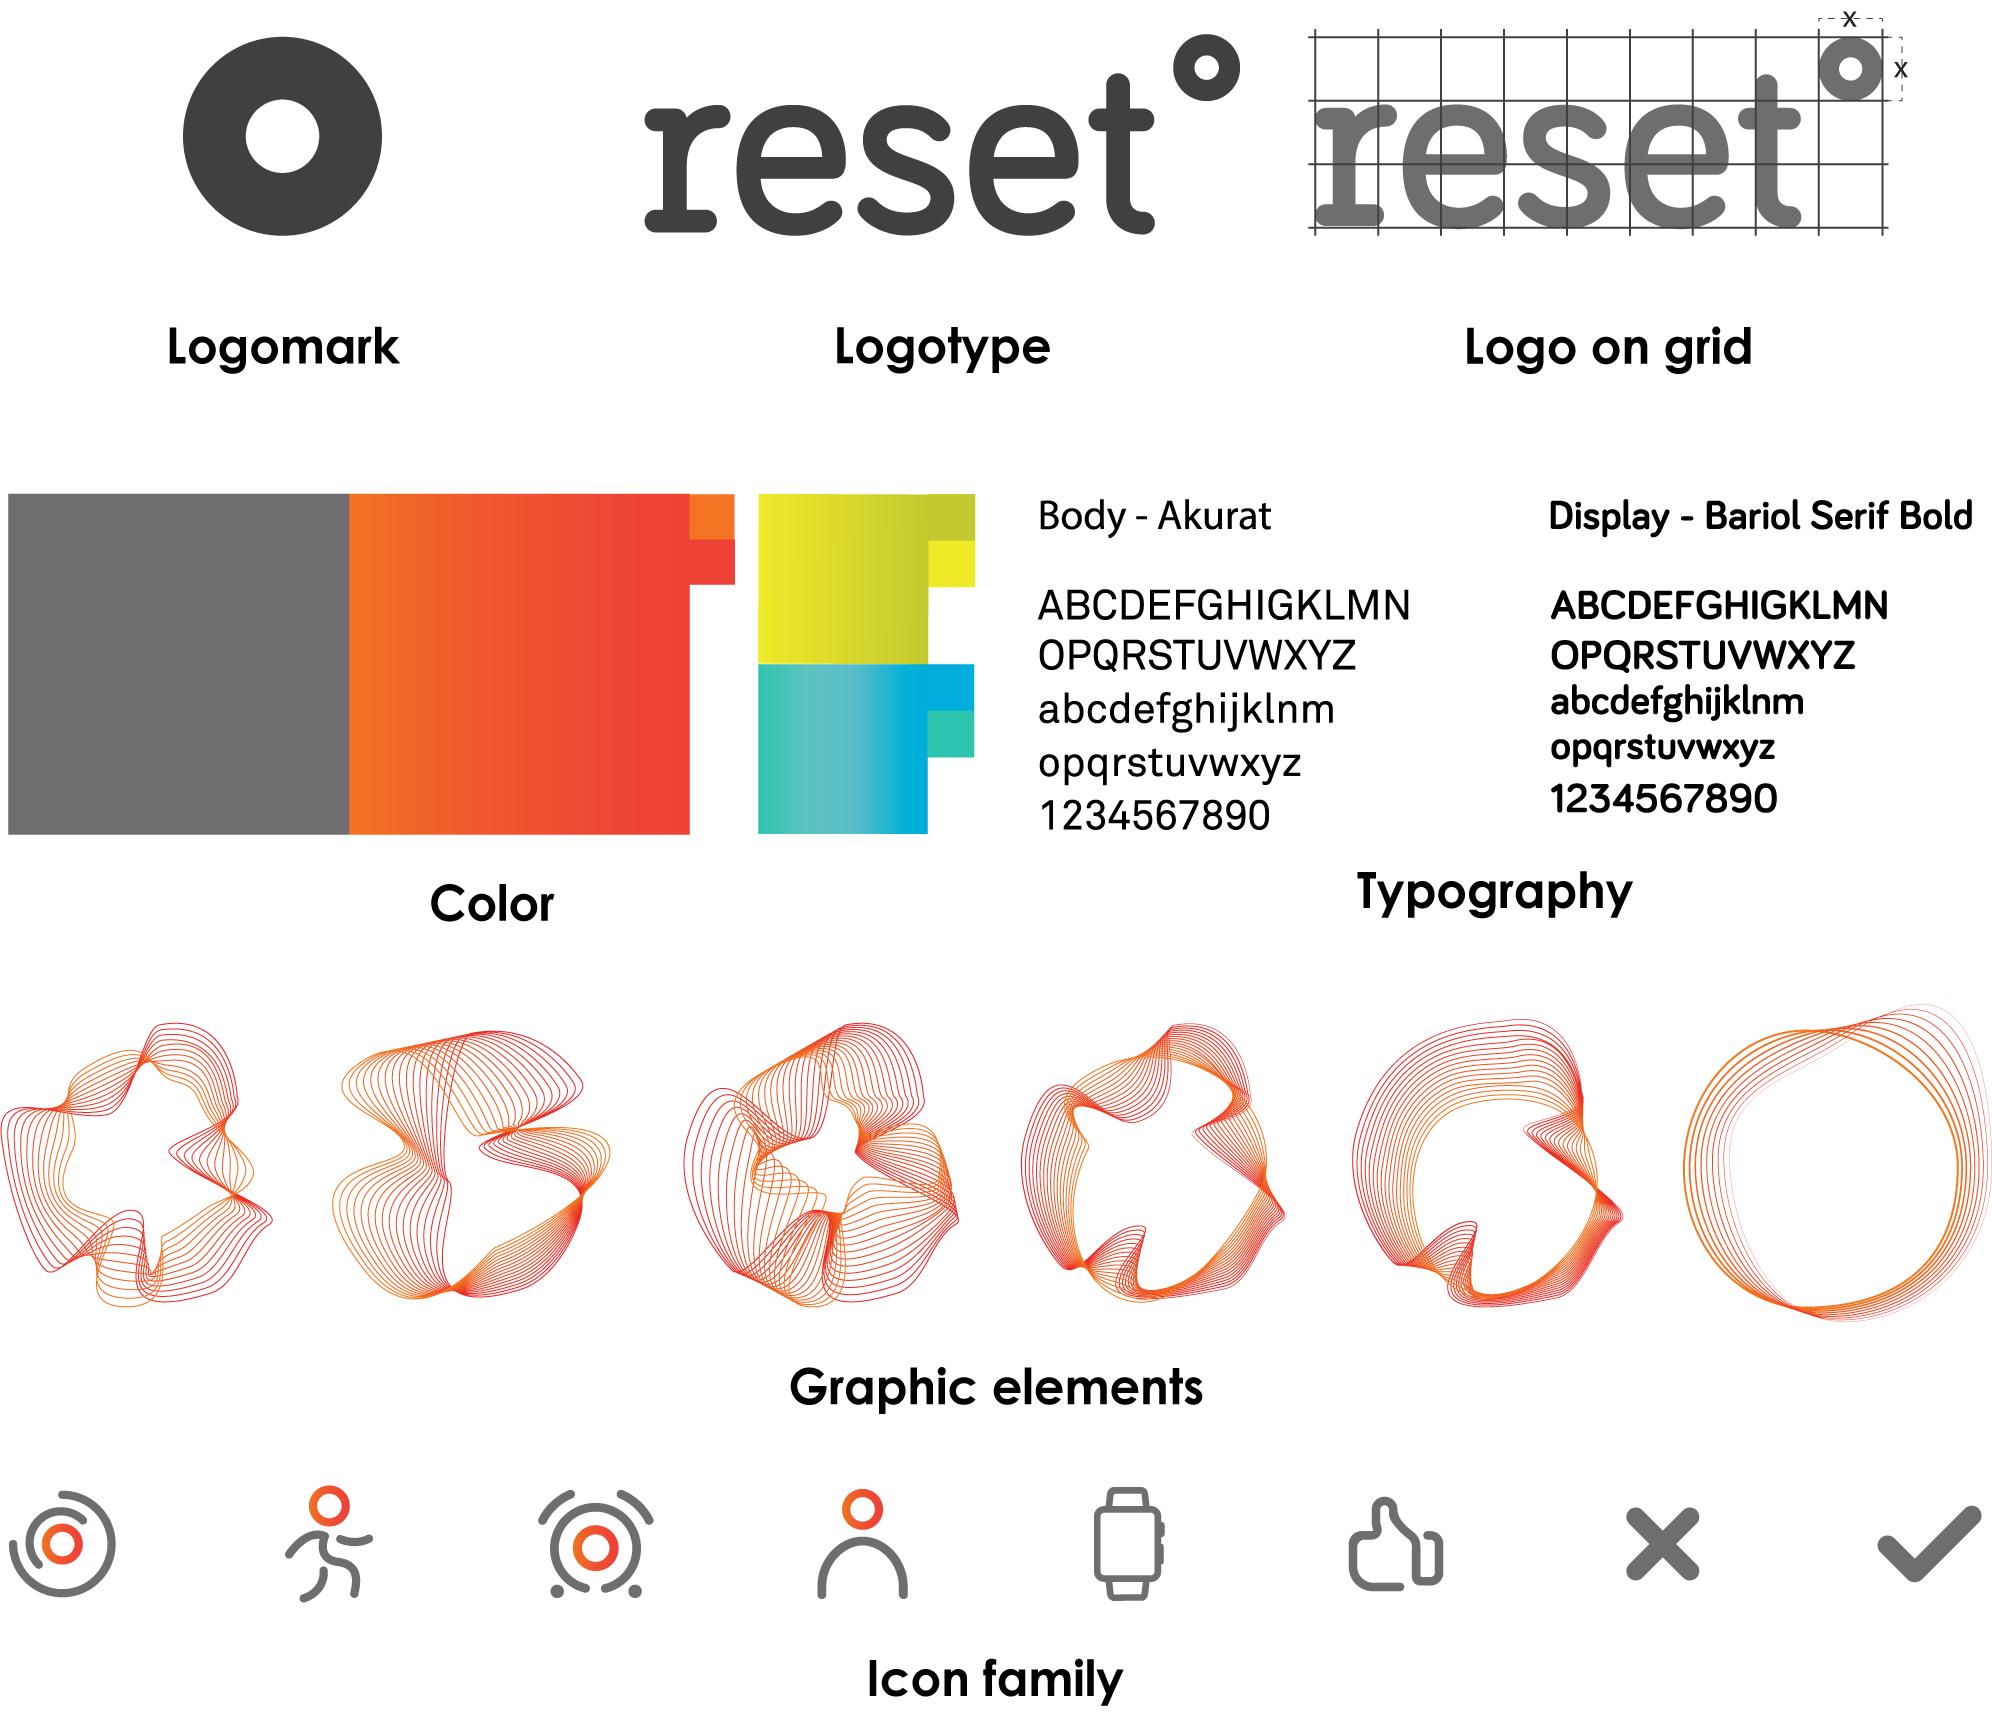 Reset_GxiDAsset 33.png